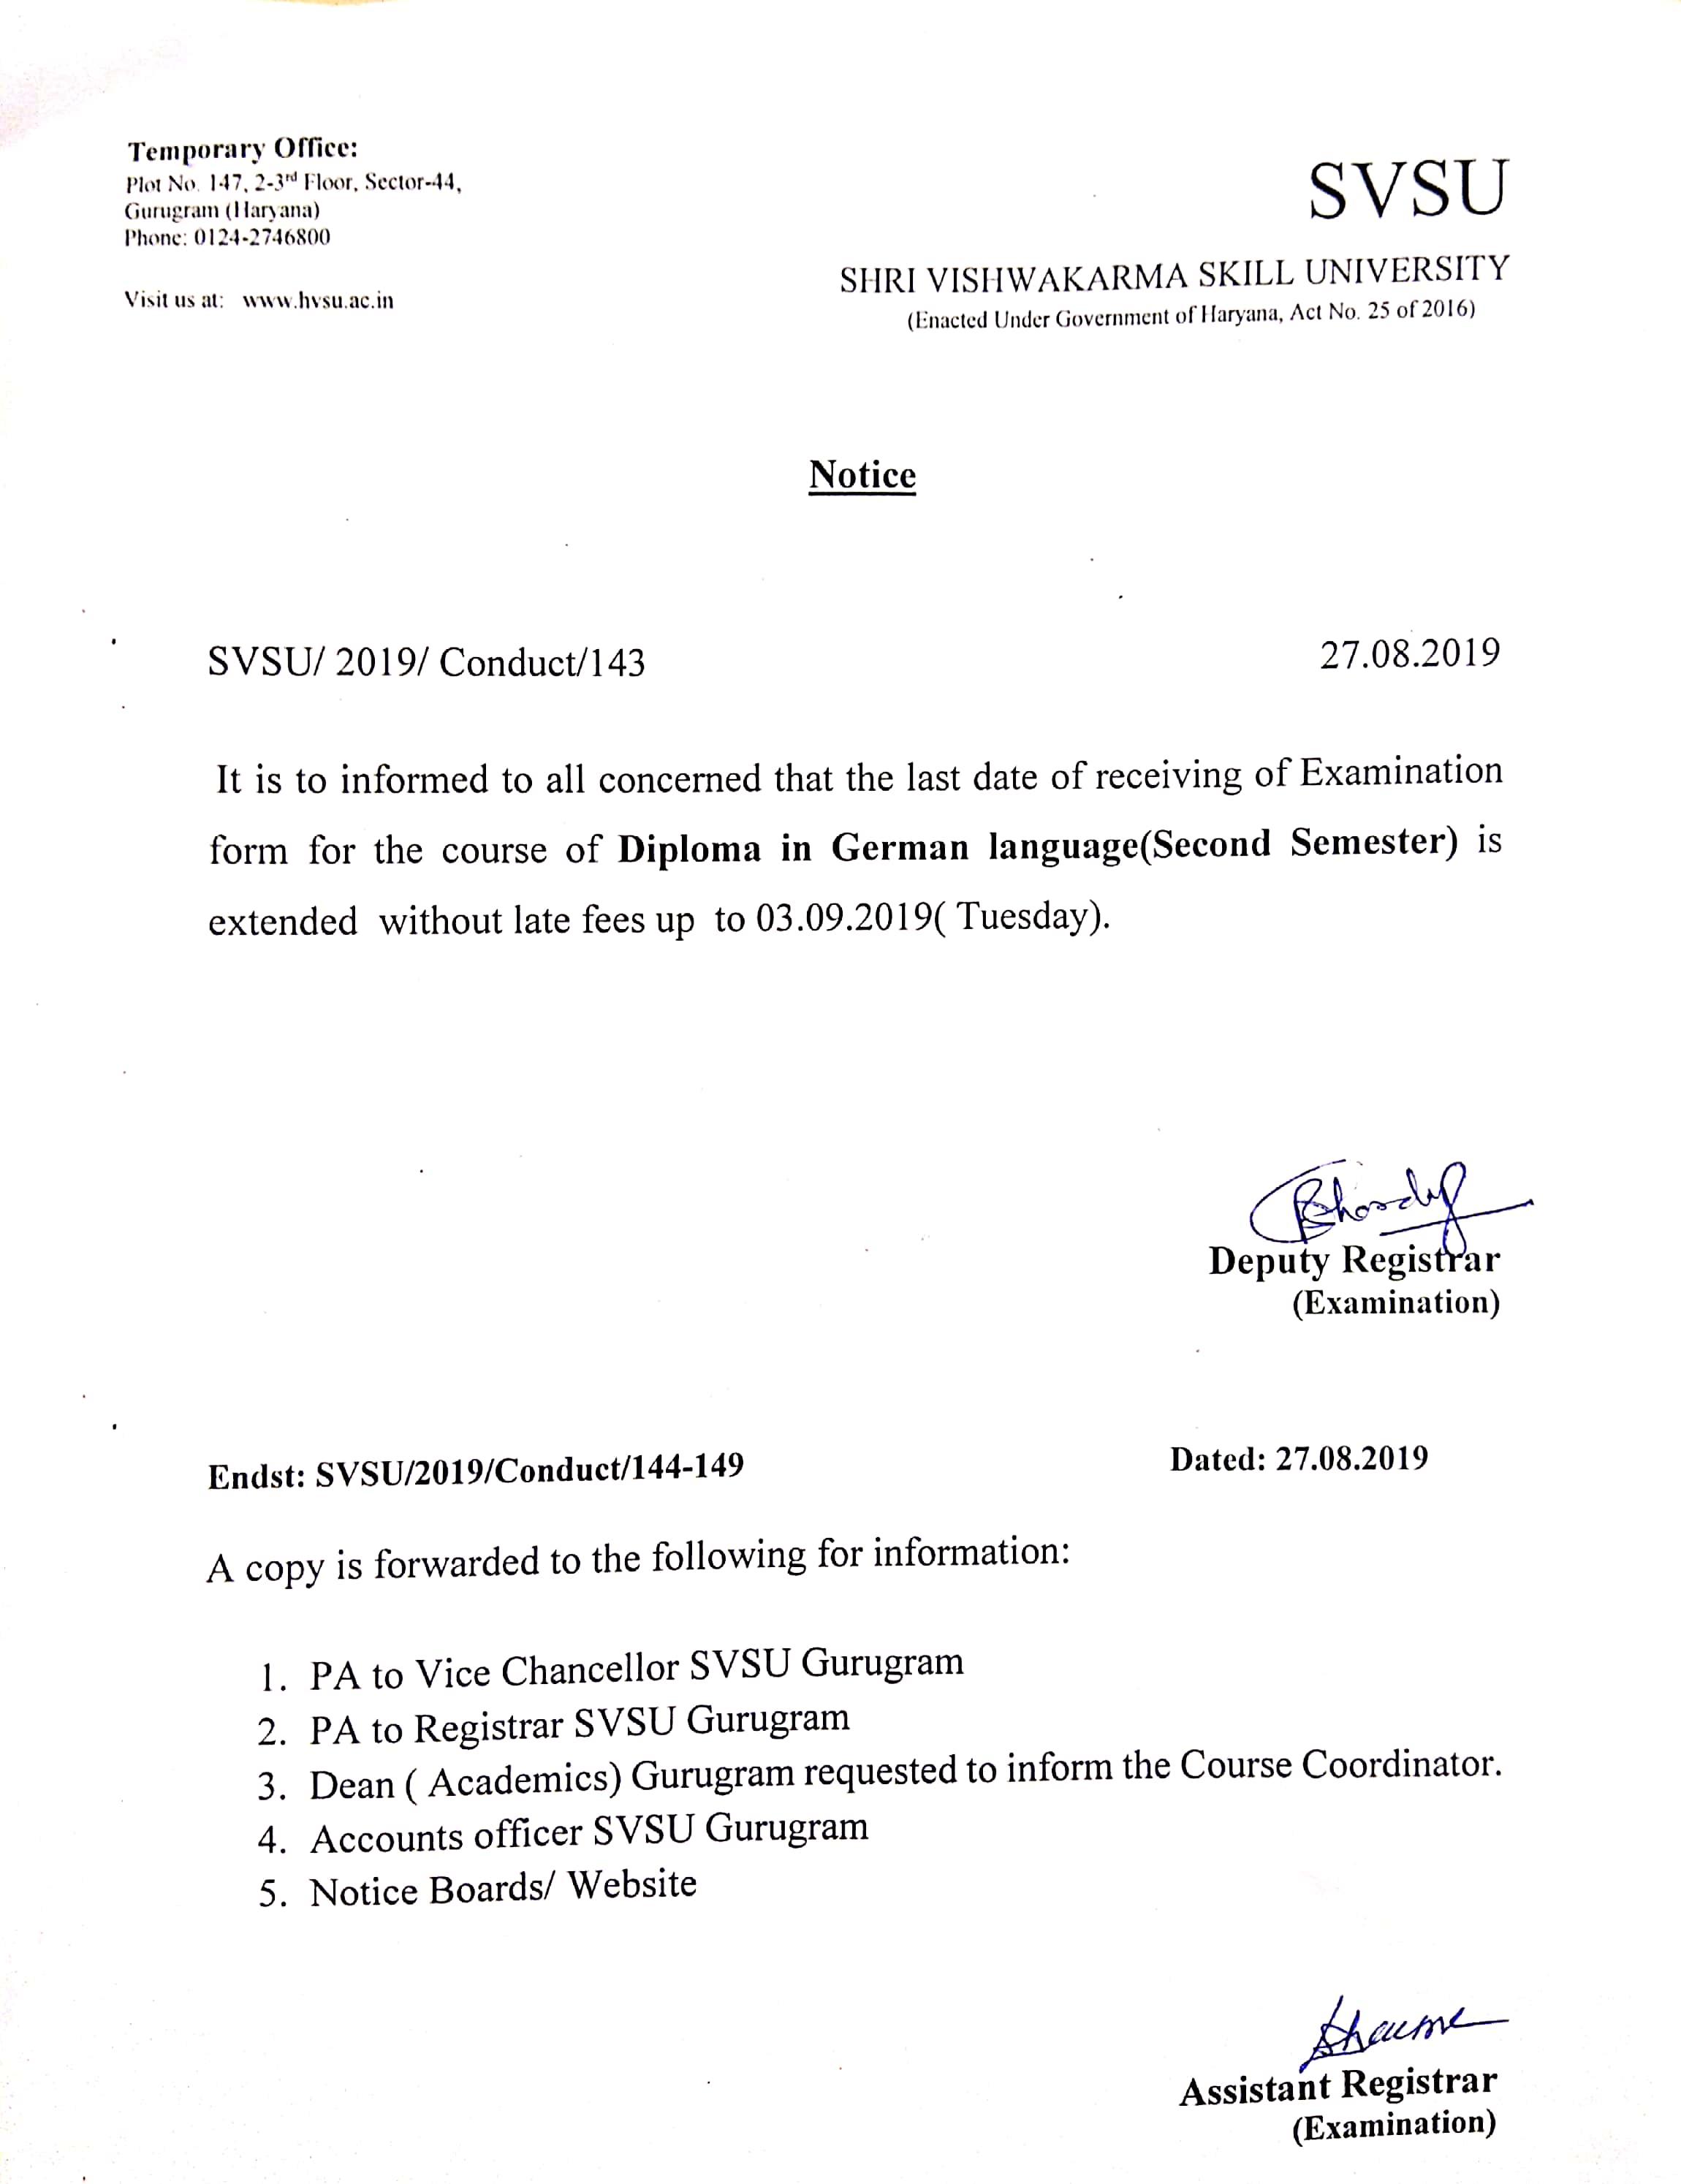 Shri Viswakarma Skill University - India's 1st Government